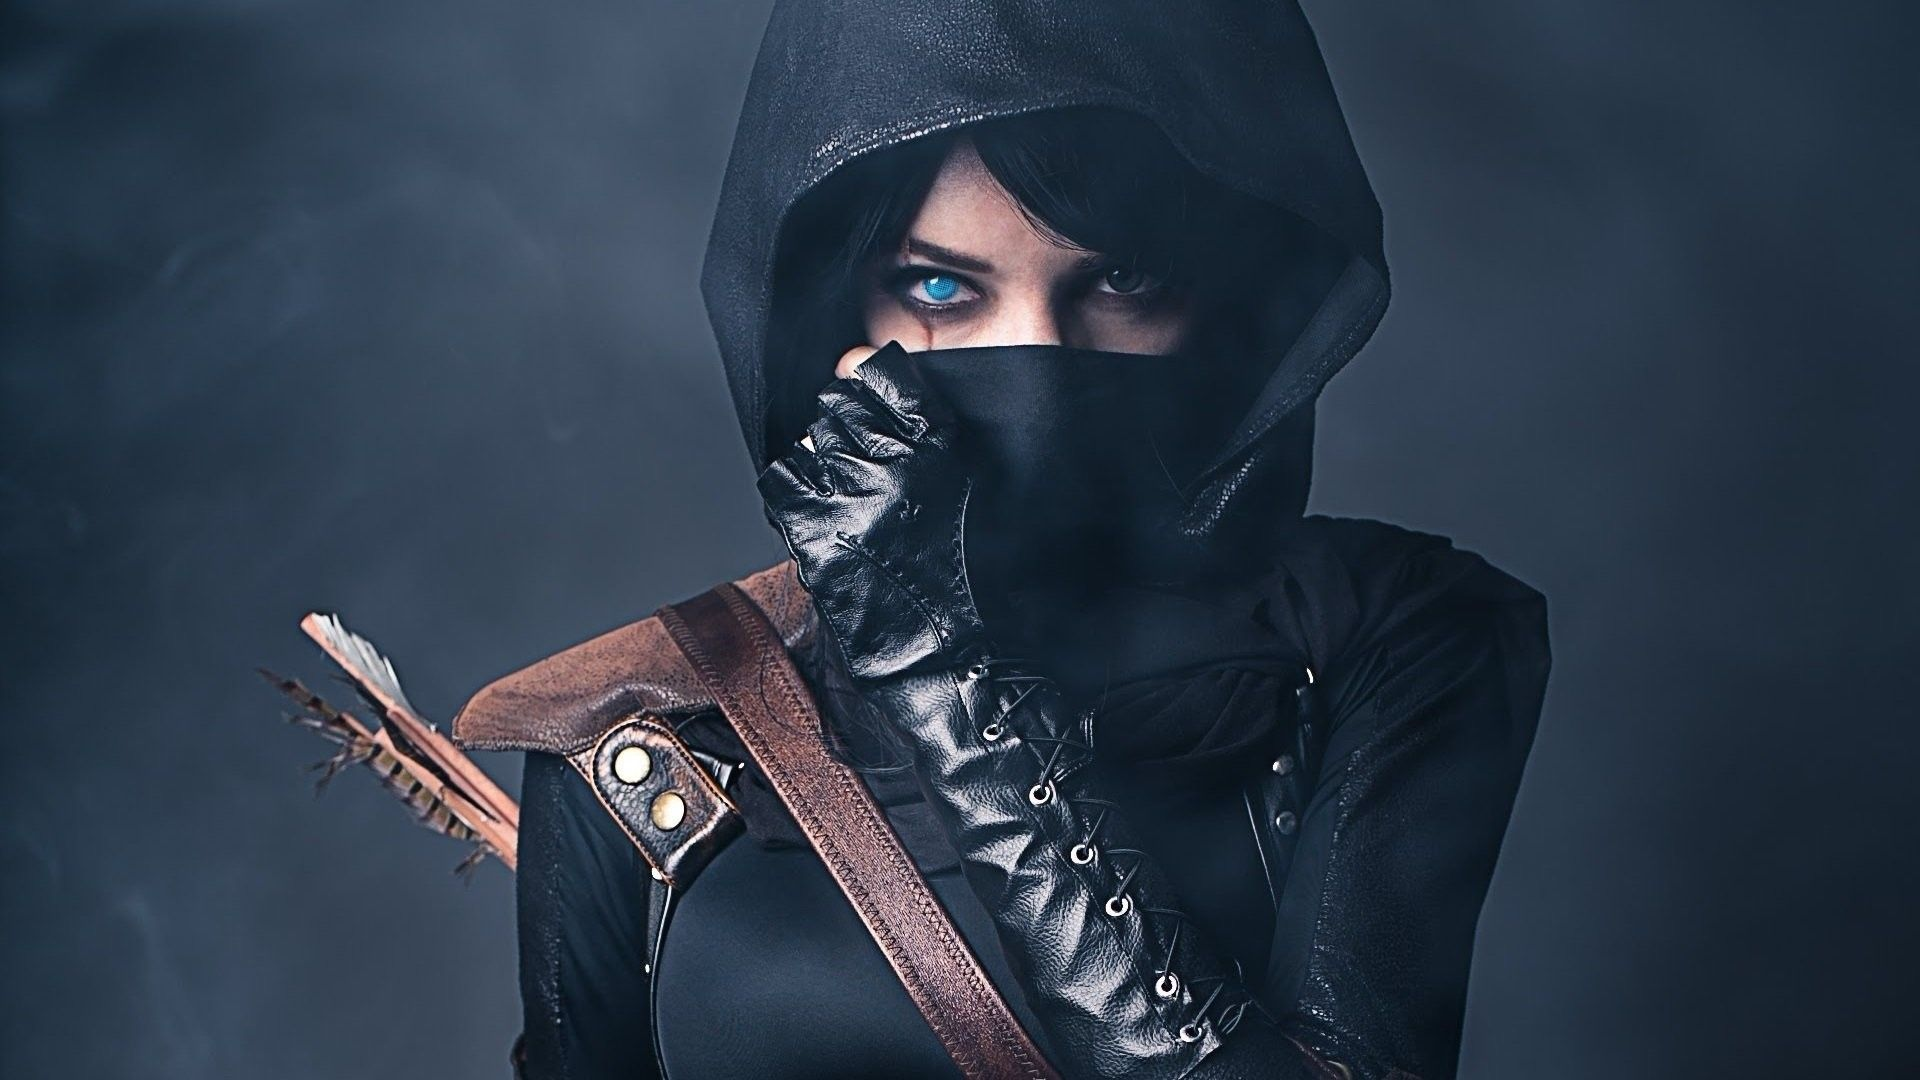 ninja wallpaper hd